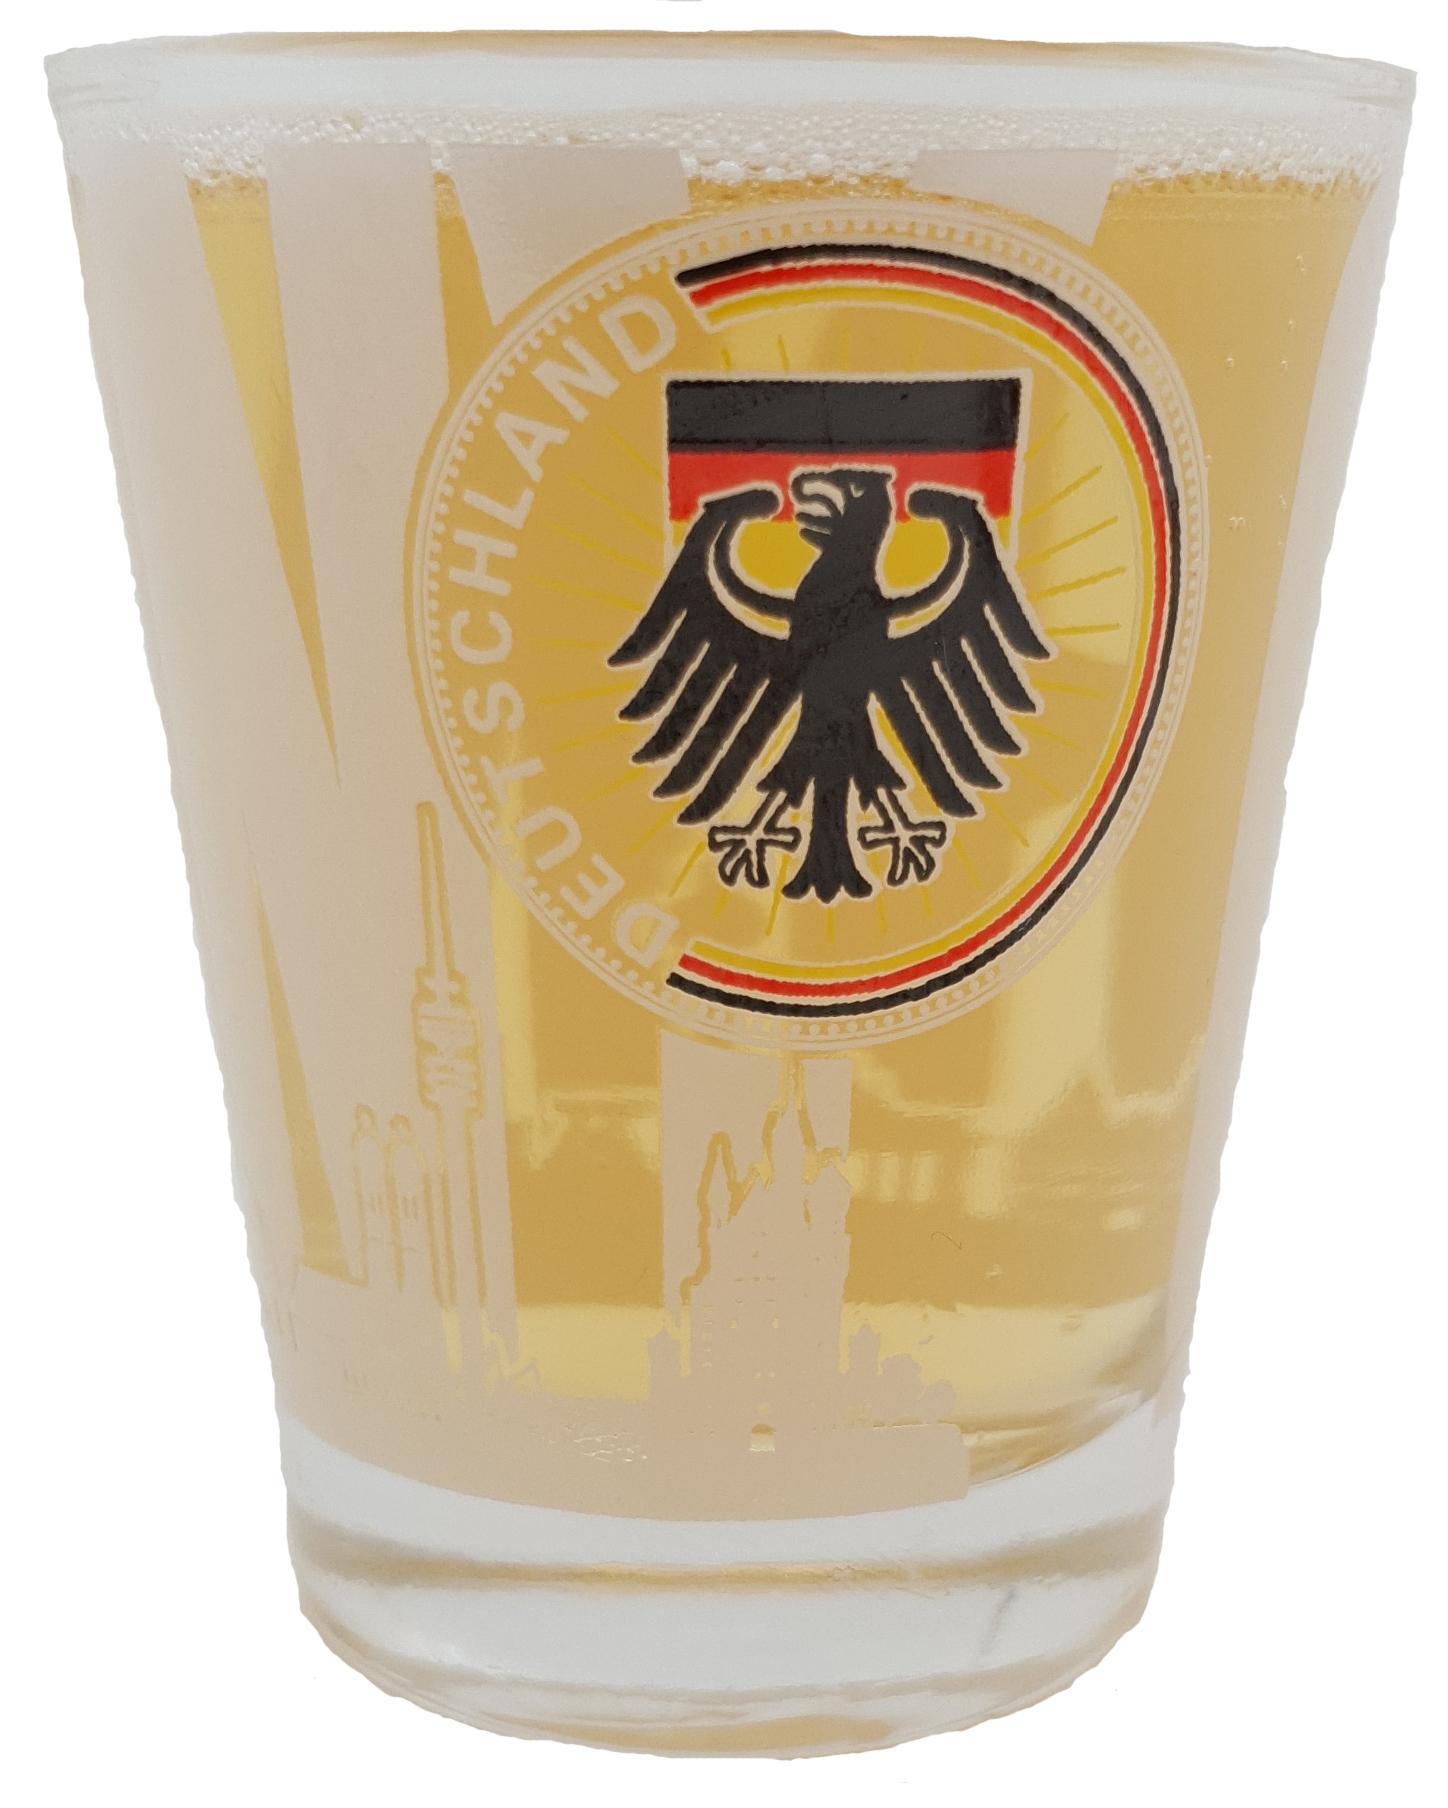 GER08-8021_Schnapsglas_Germany_Skyline_Stempel